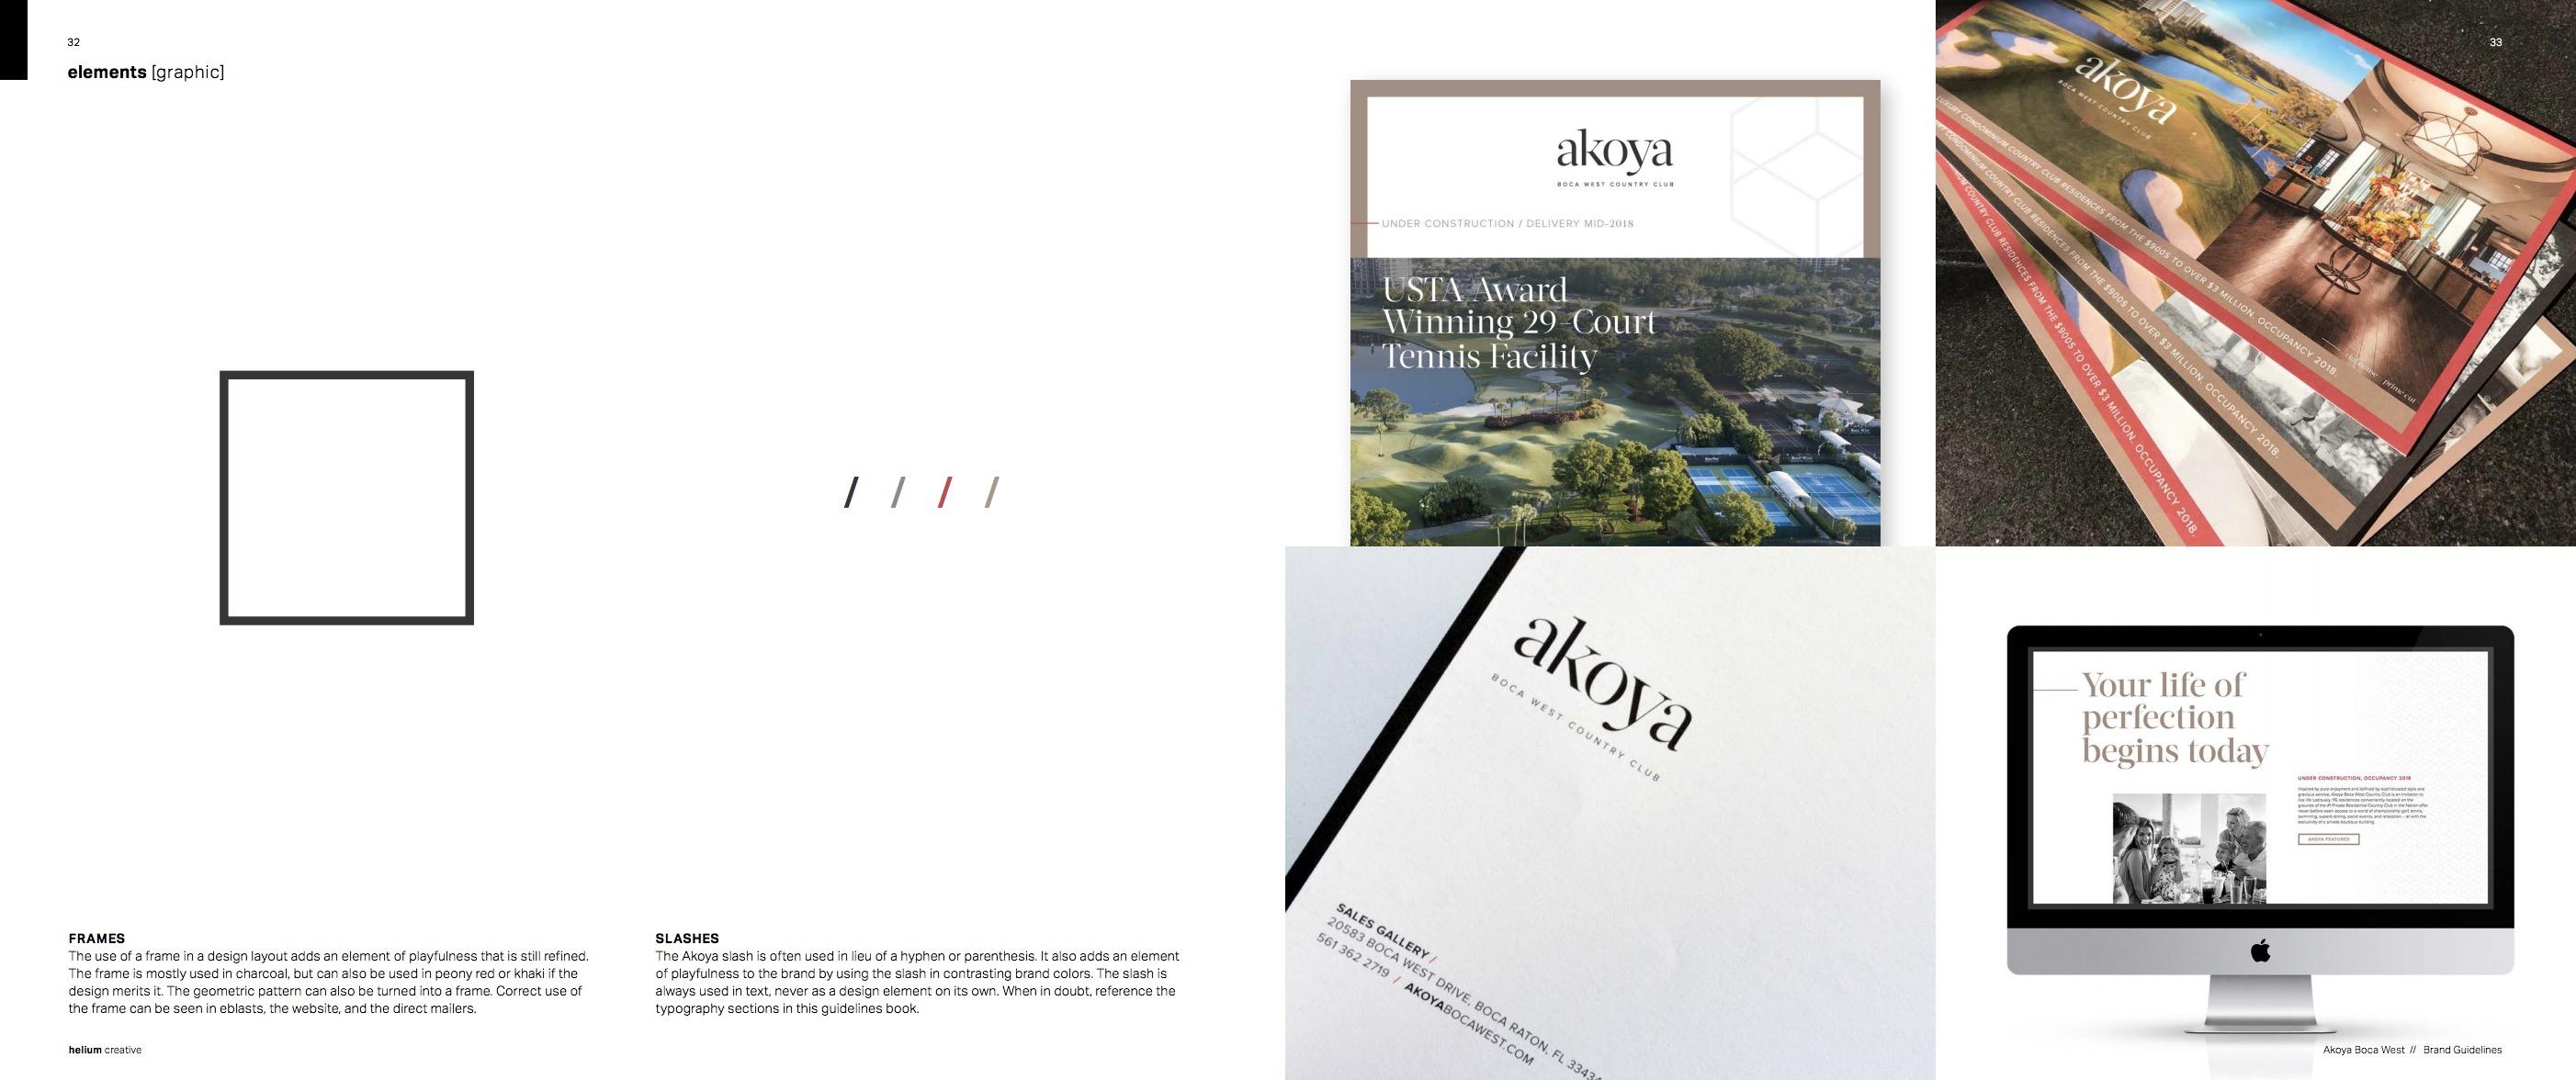 Akoya Brand Launch Campaign | helium creative